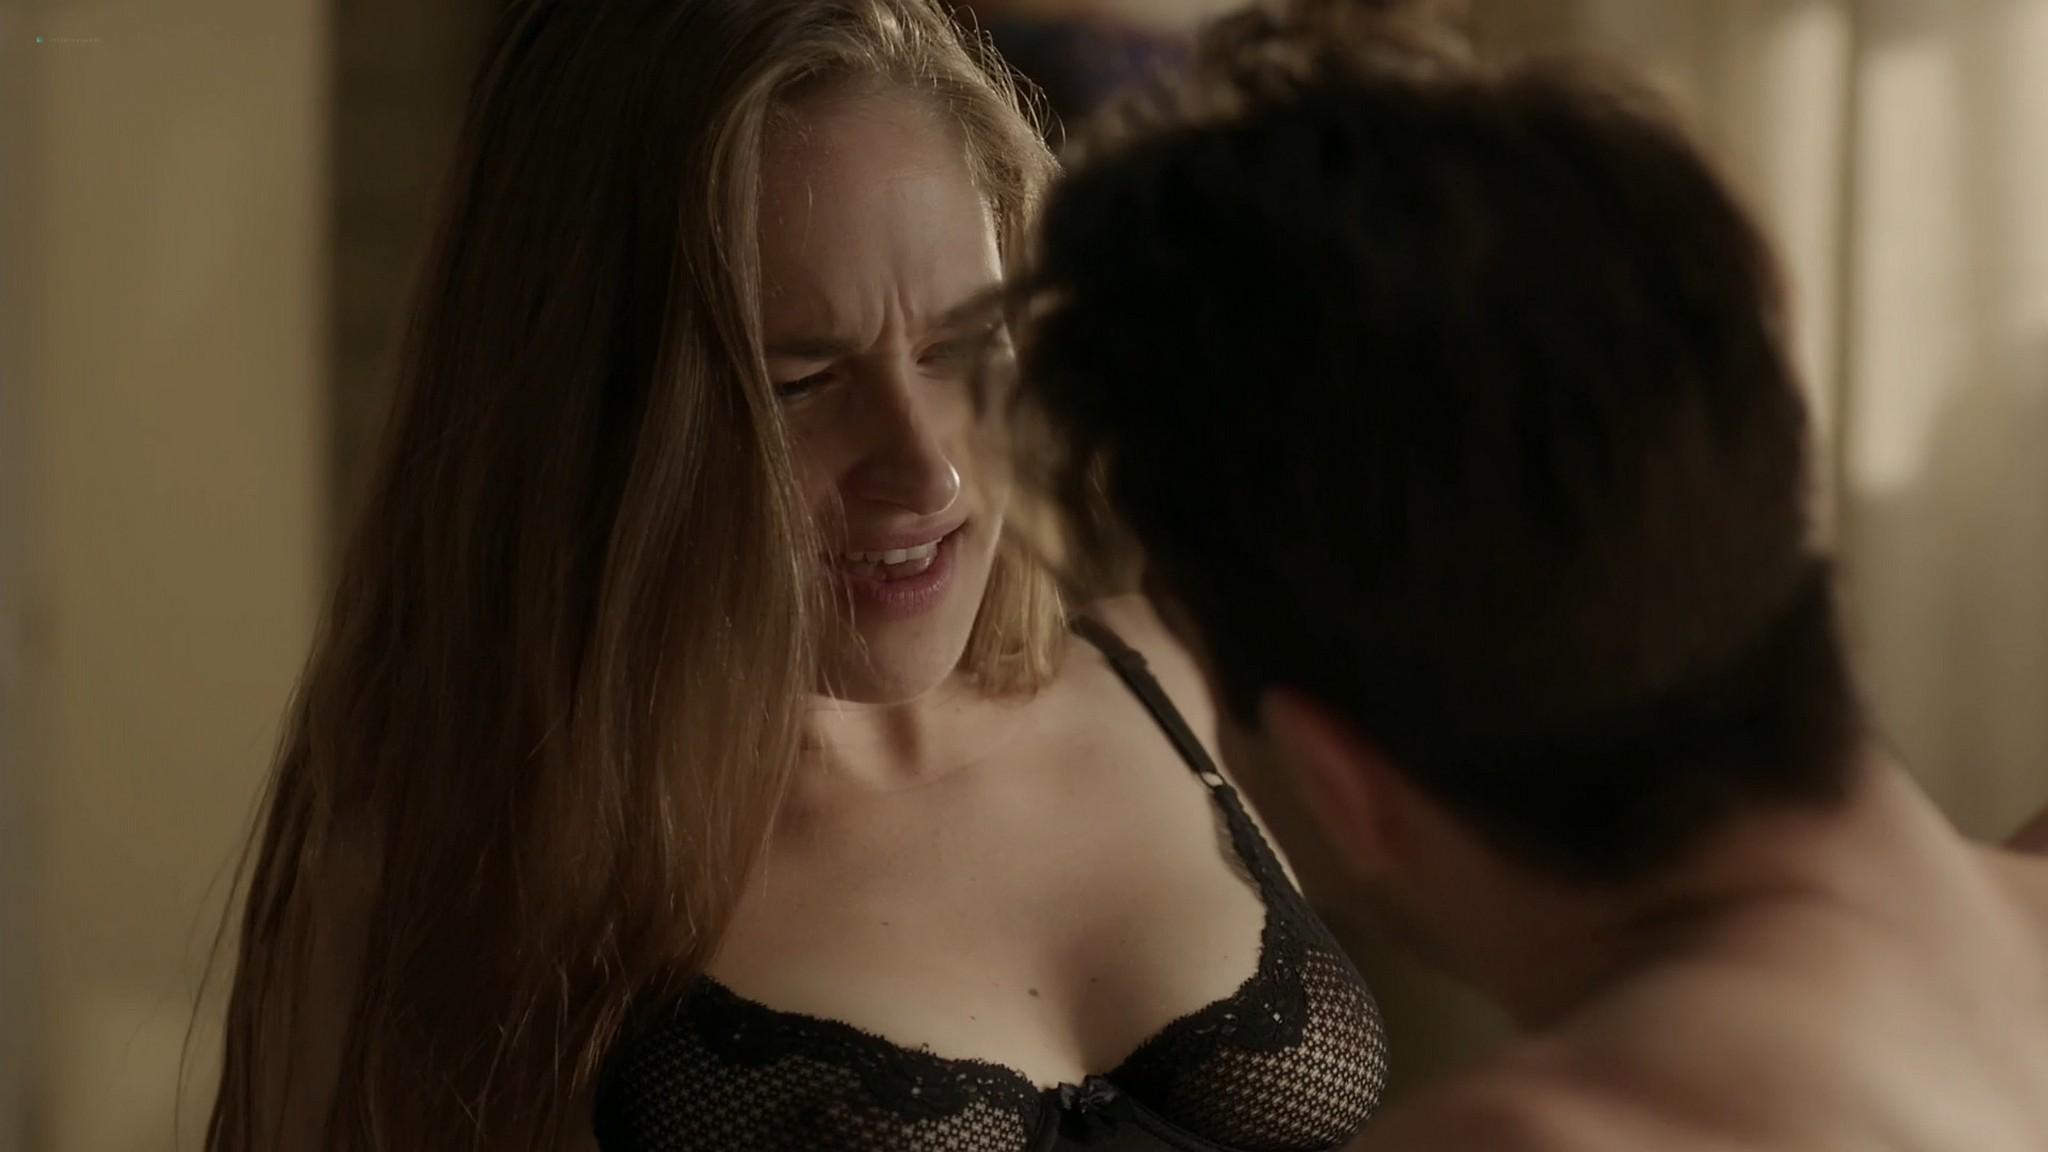 Gaby Hoffmann nude bush Allison Williams Lena Dunham hot Girls 2012 s4 1080p Web 15